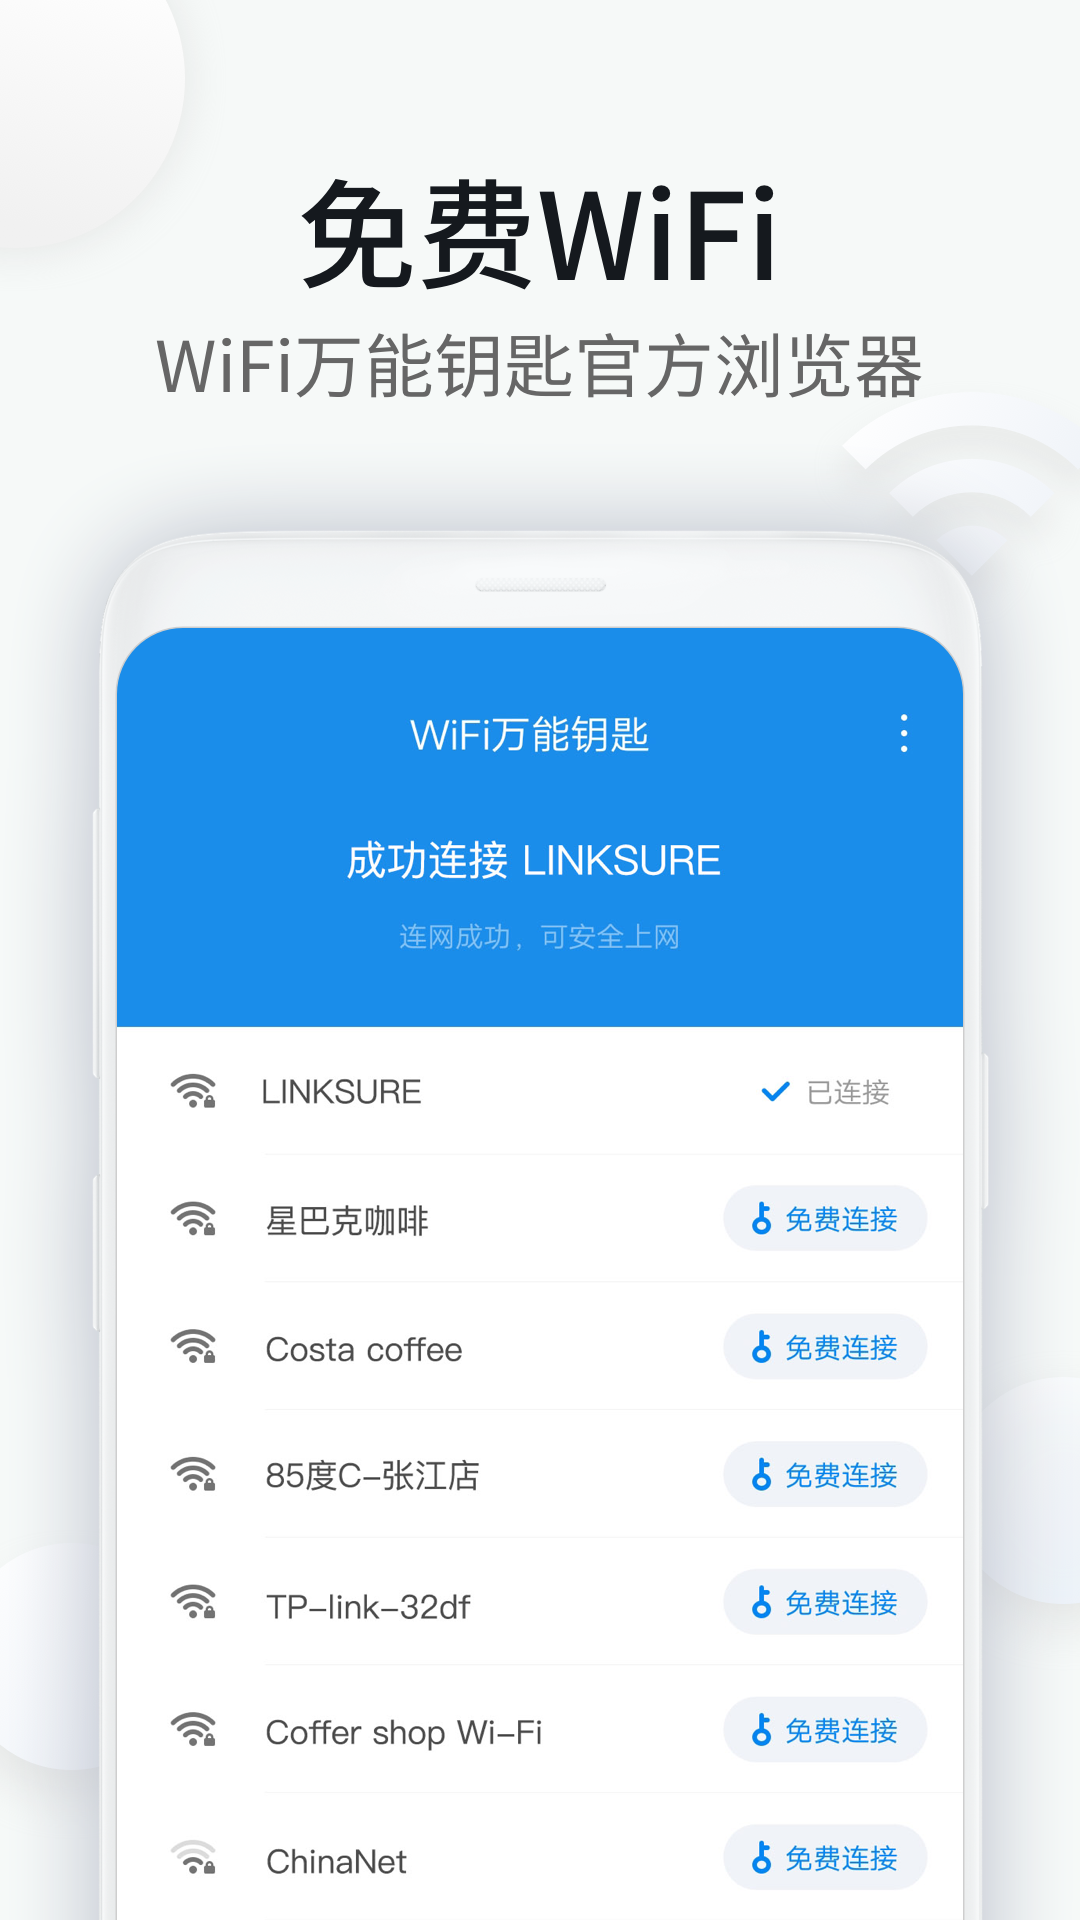 WiFi万能钥匙浏览器